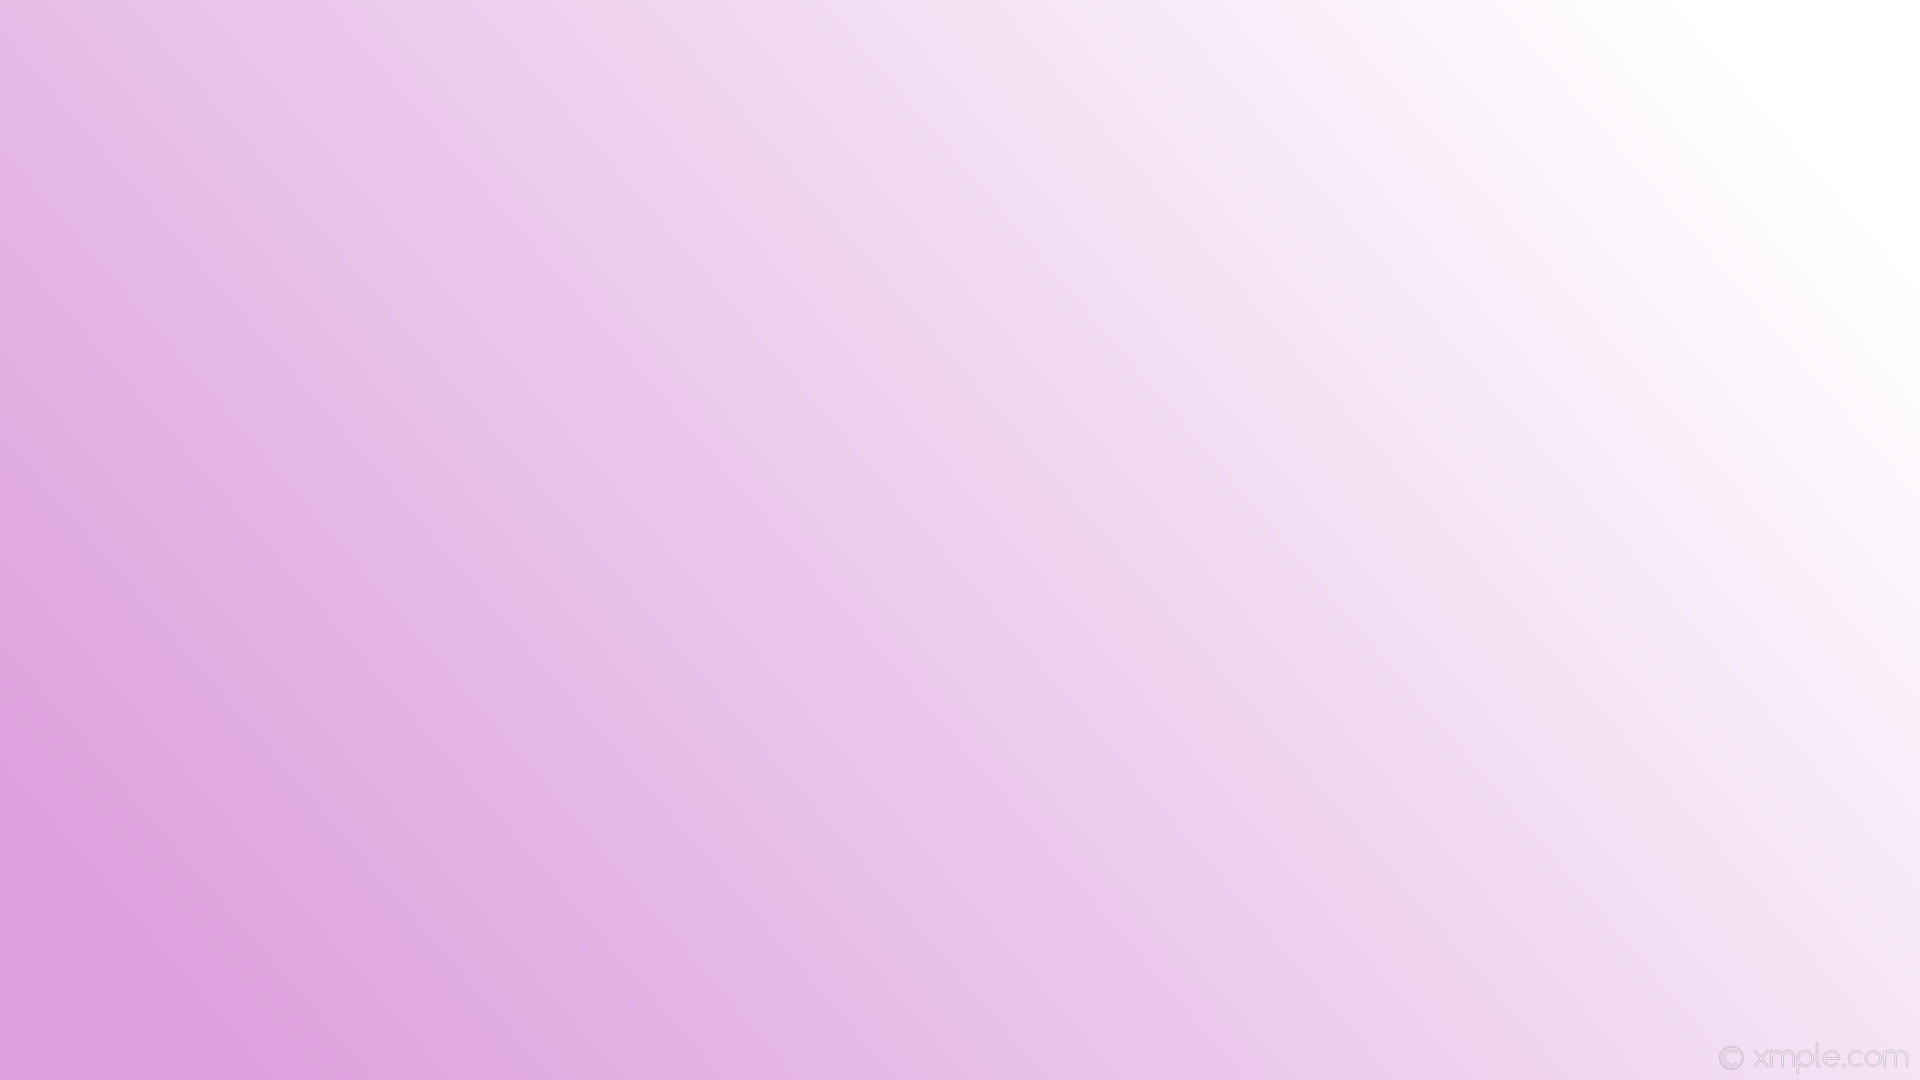 wallpaper gradient purple white linear plum #ffffff #dda0dd 15°